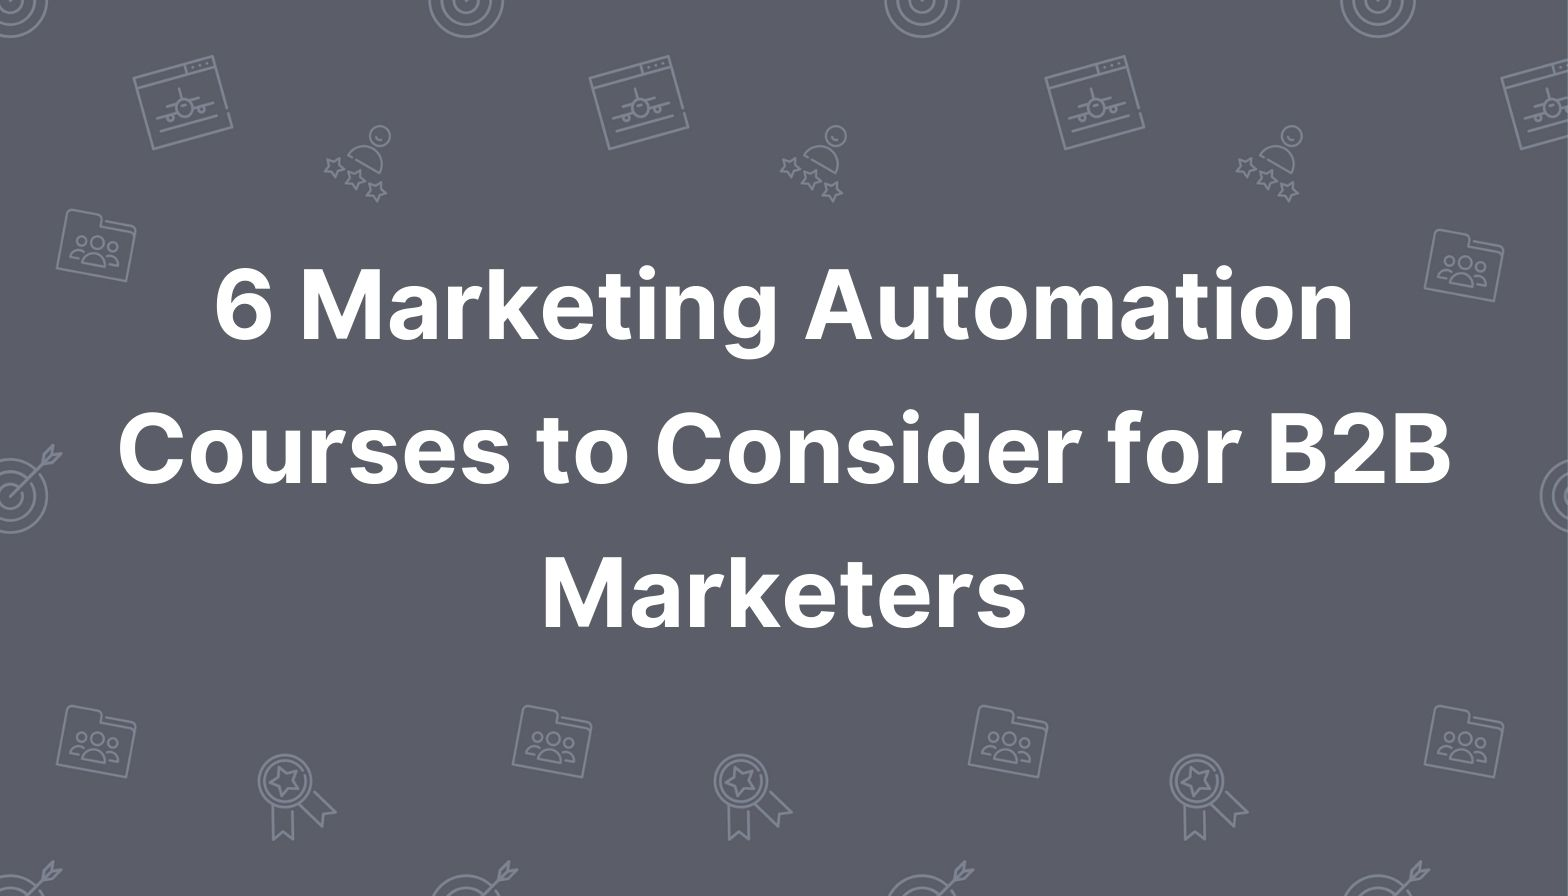 Marketing automation courses